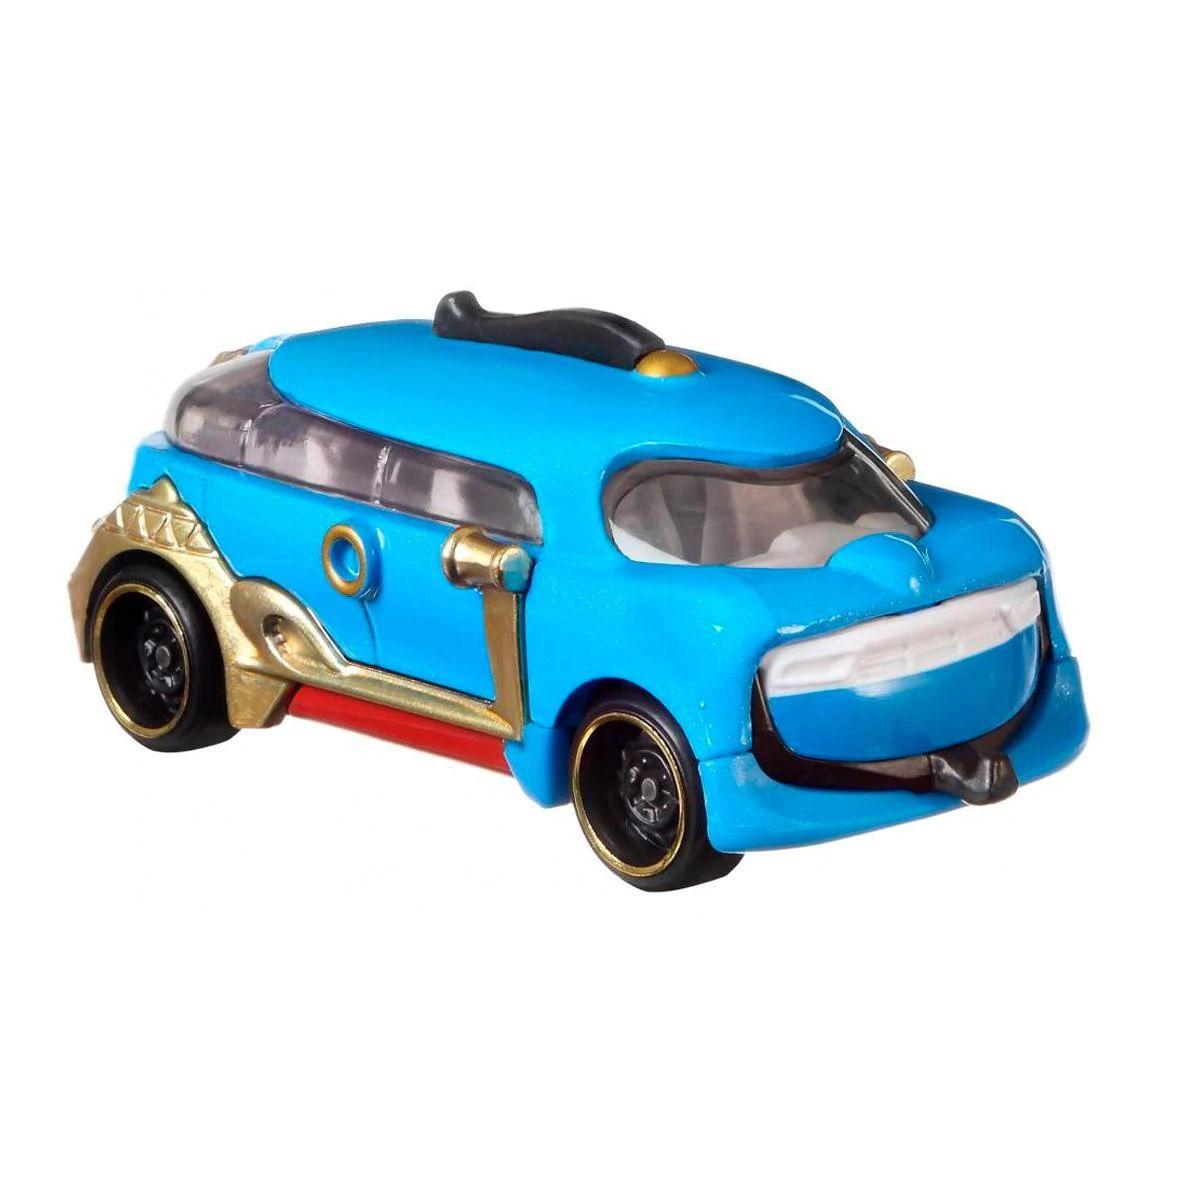 Carrinho Hot Wheels Gênio: Disney (Series 4) - Mattel